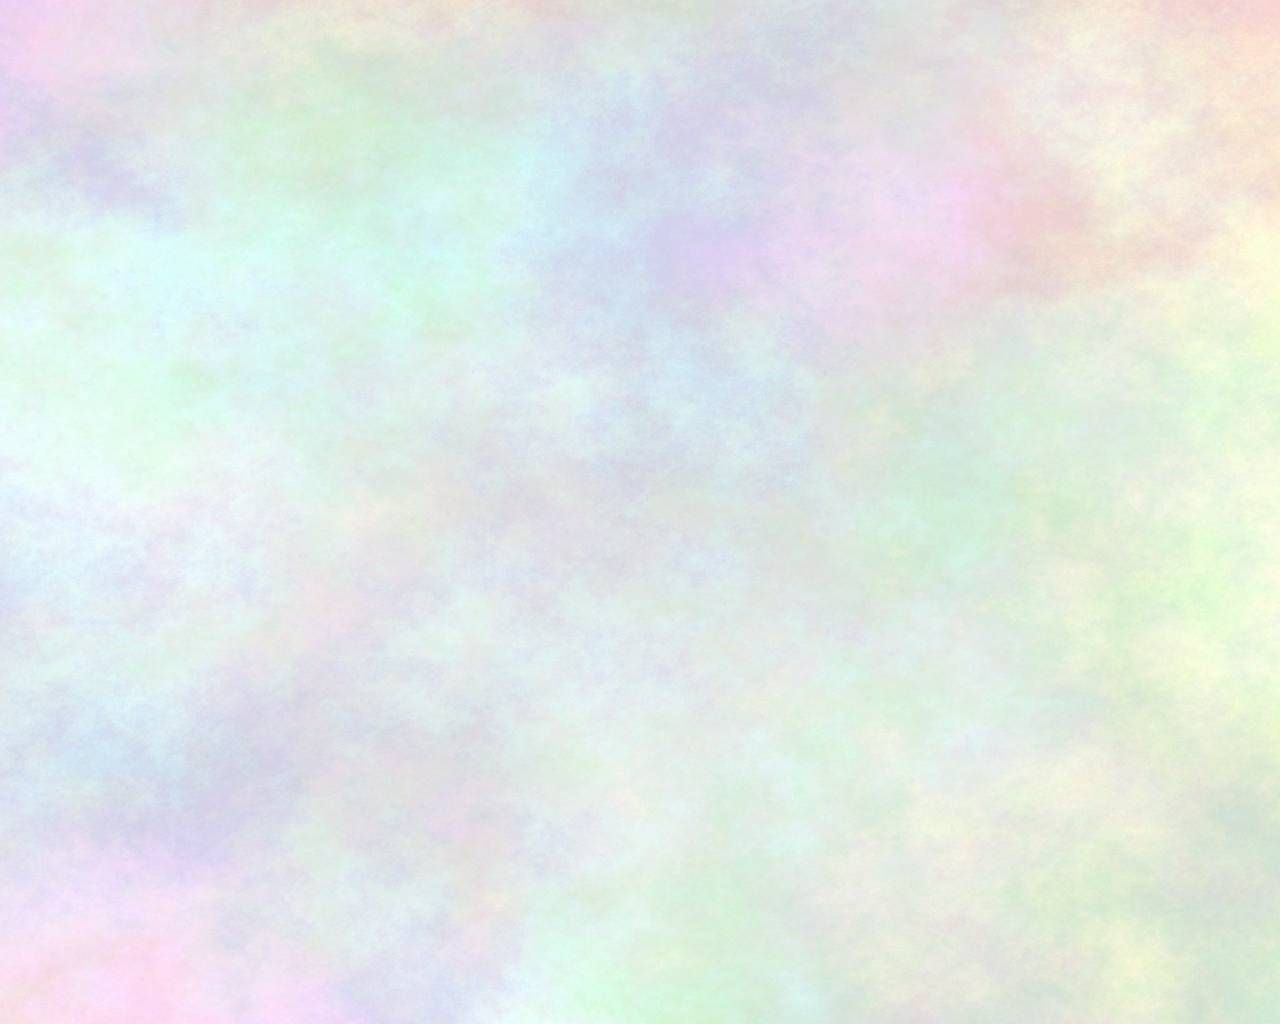 pastel colors tumblr - Buscar con Google | Lock screen